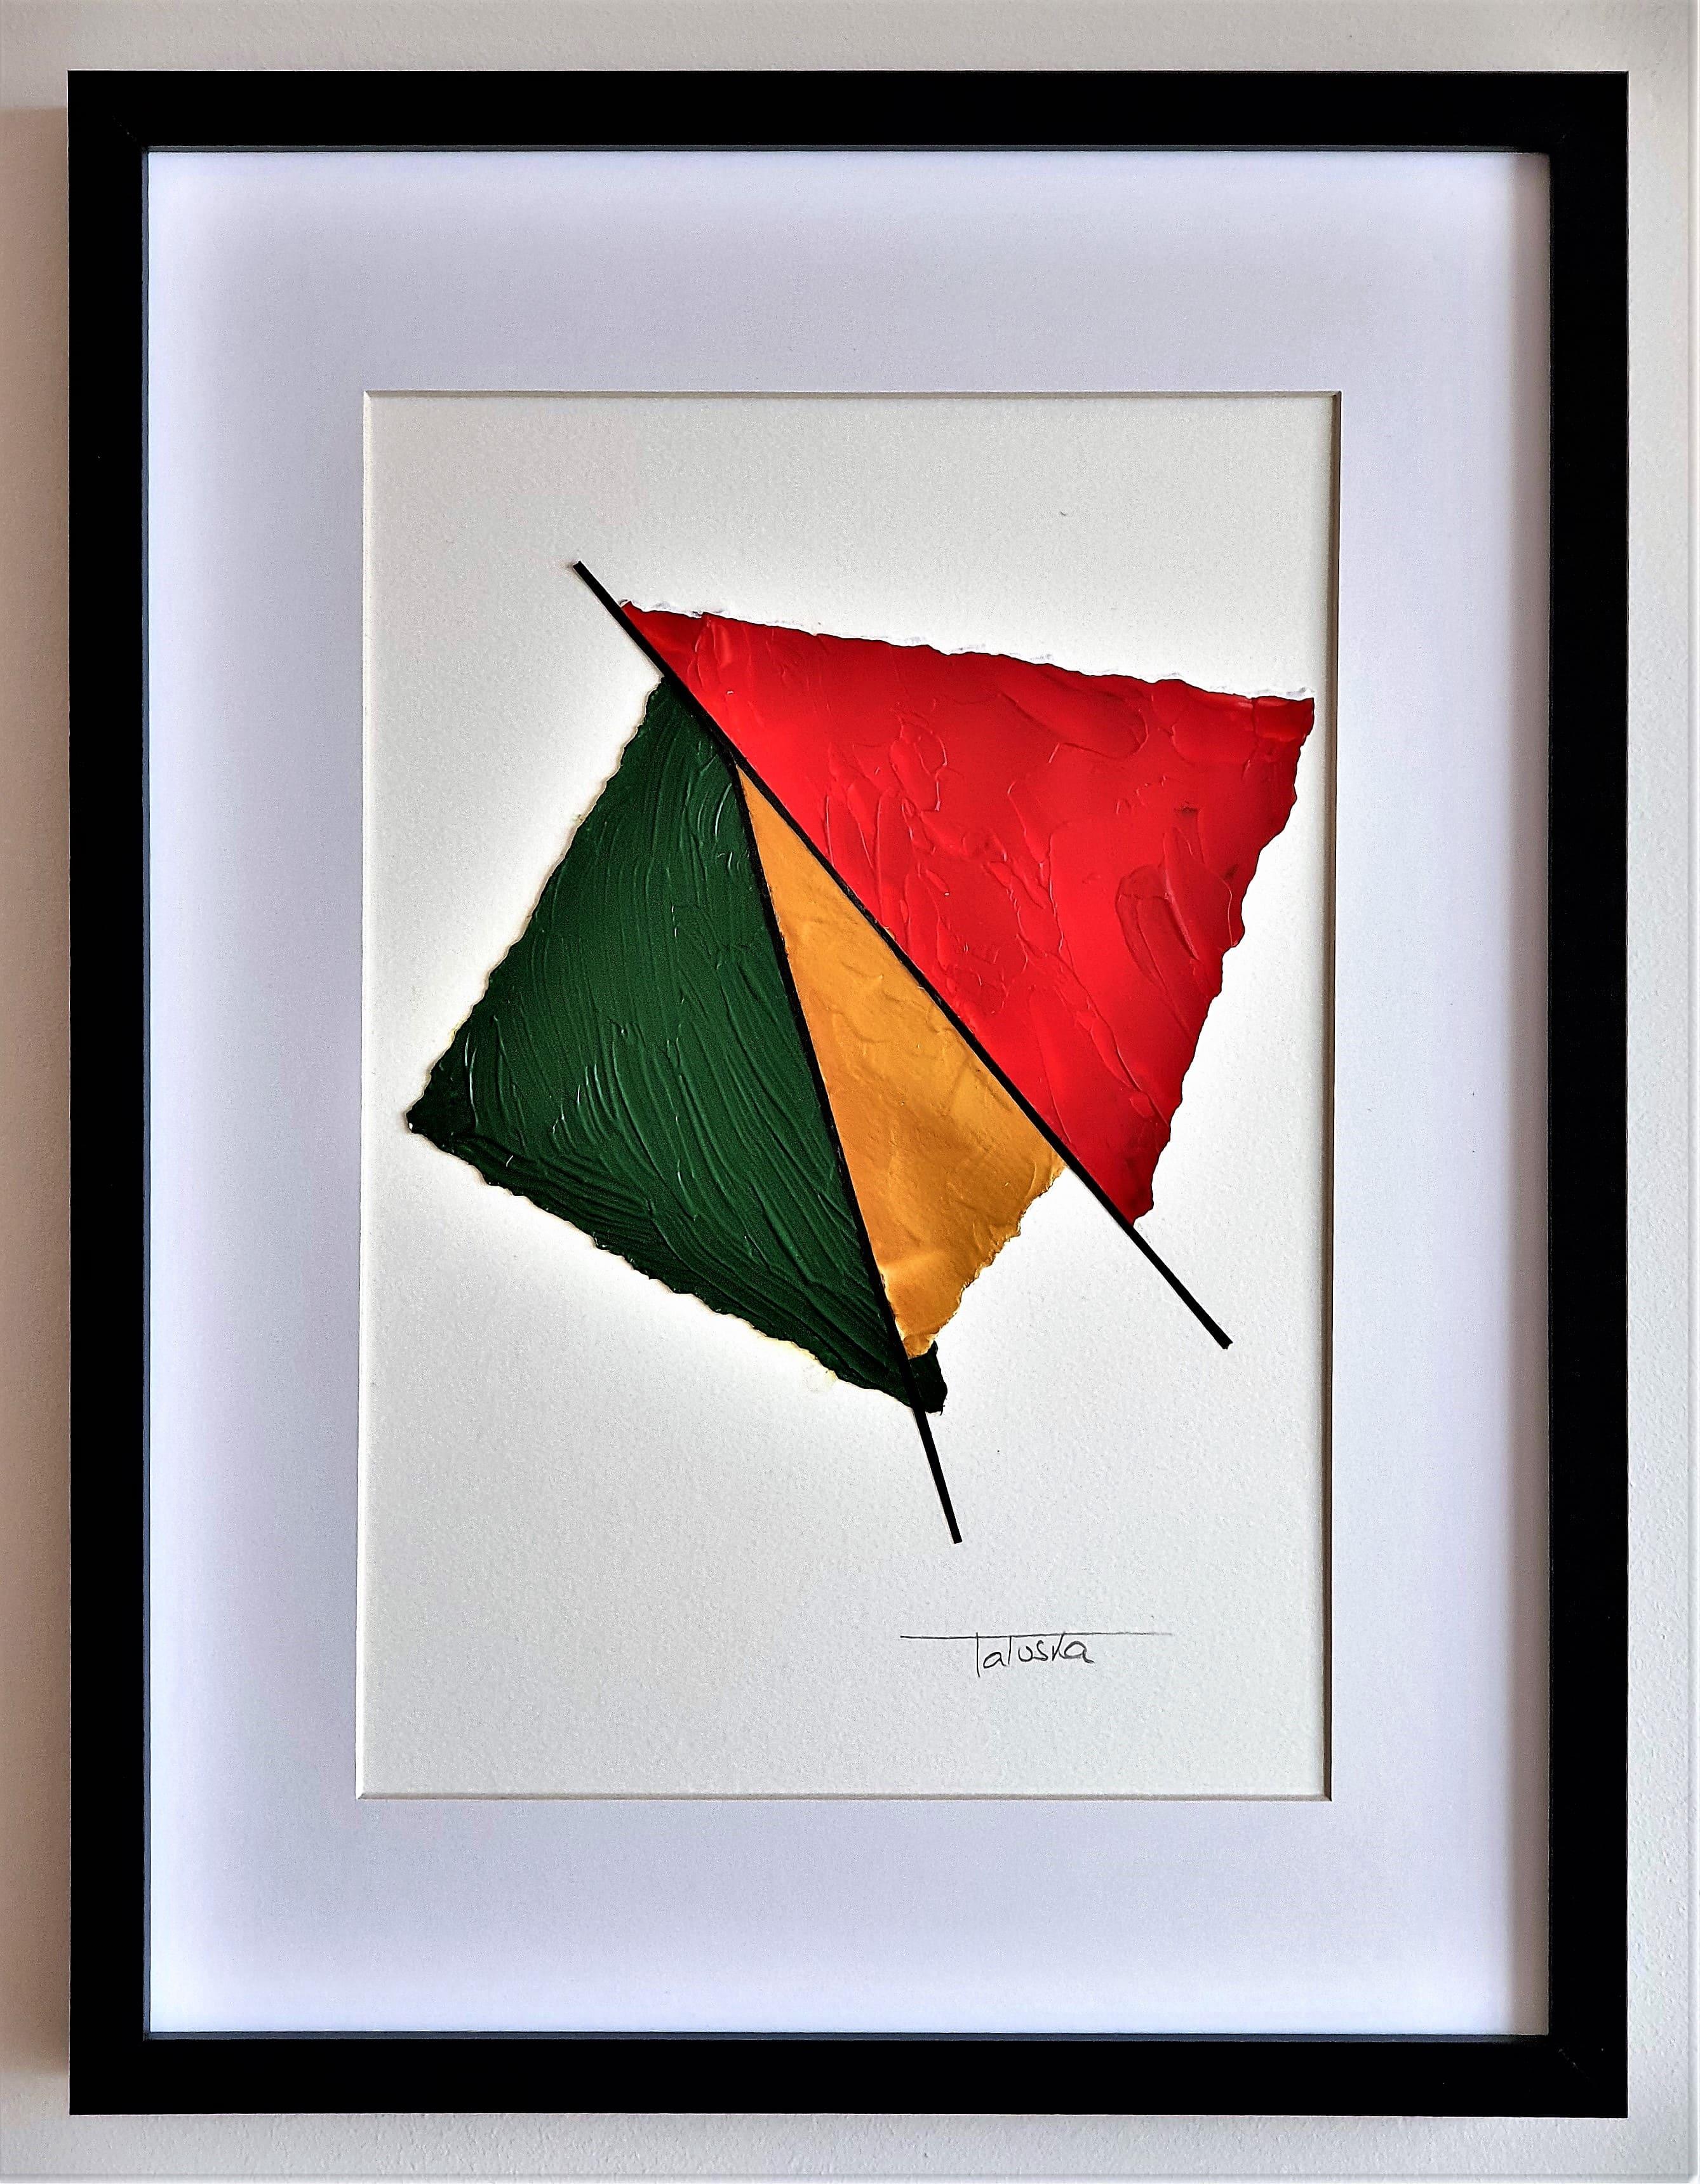 "Cuadro original de arte abstracto moderno decorativo con texturas original contemporáneo para sala, salón, dormitorio, comedor 30x40 cm.  titulado ""Butterfly"", obra de la artista de arte contemporáneo Tatuska"